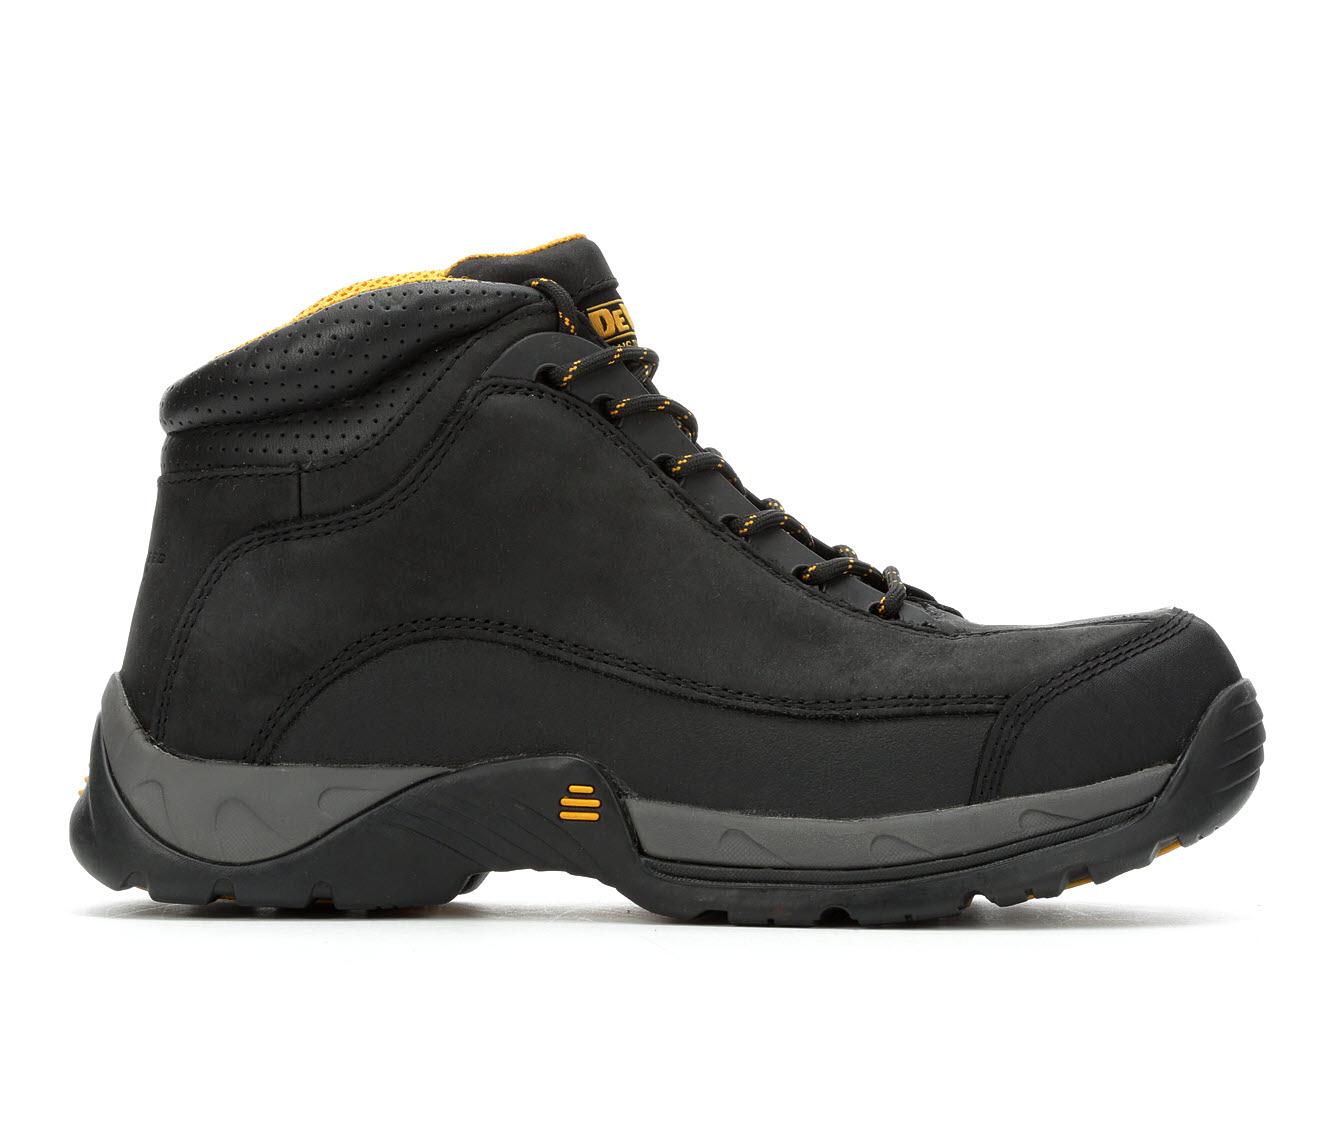 DeWALT Baltimore Steel Toe Hiker Men's Boots (Black Leather)